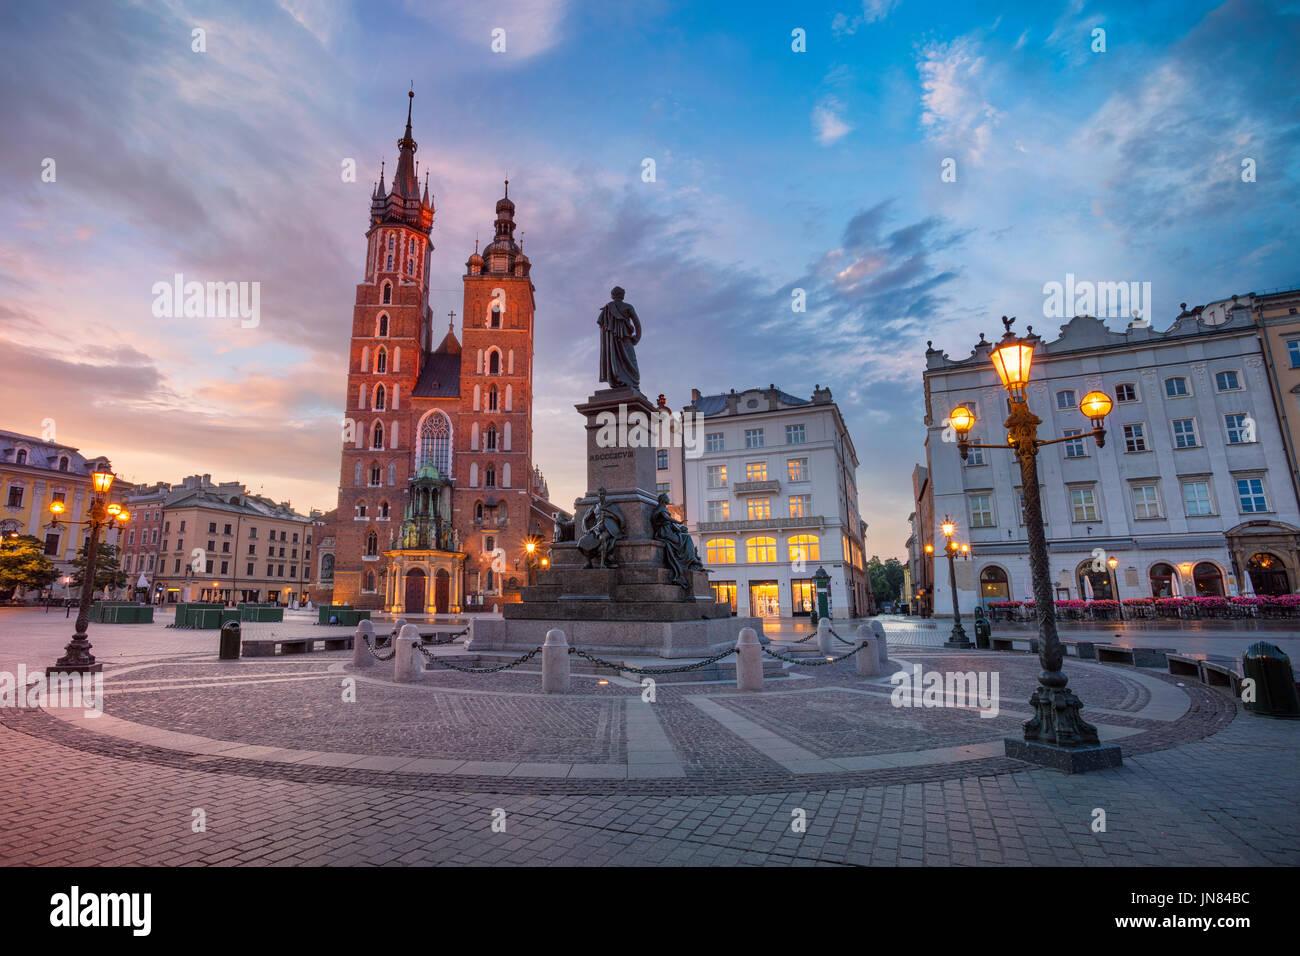 Krakow. Image of Market square Krakow, Poland during sunrise. - Stock Image